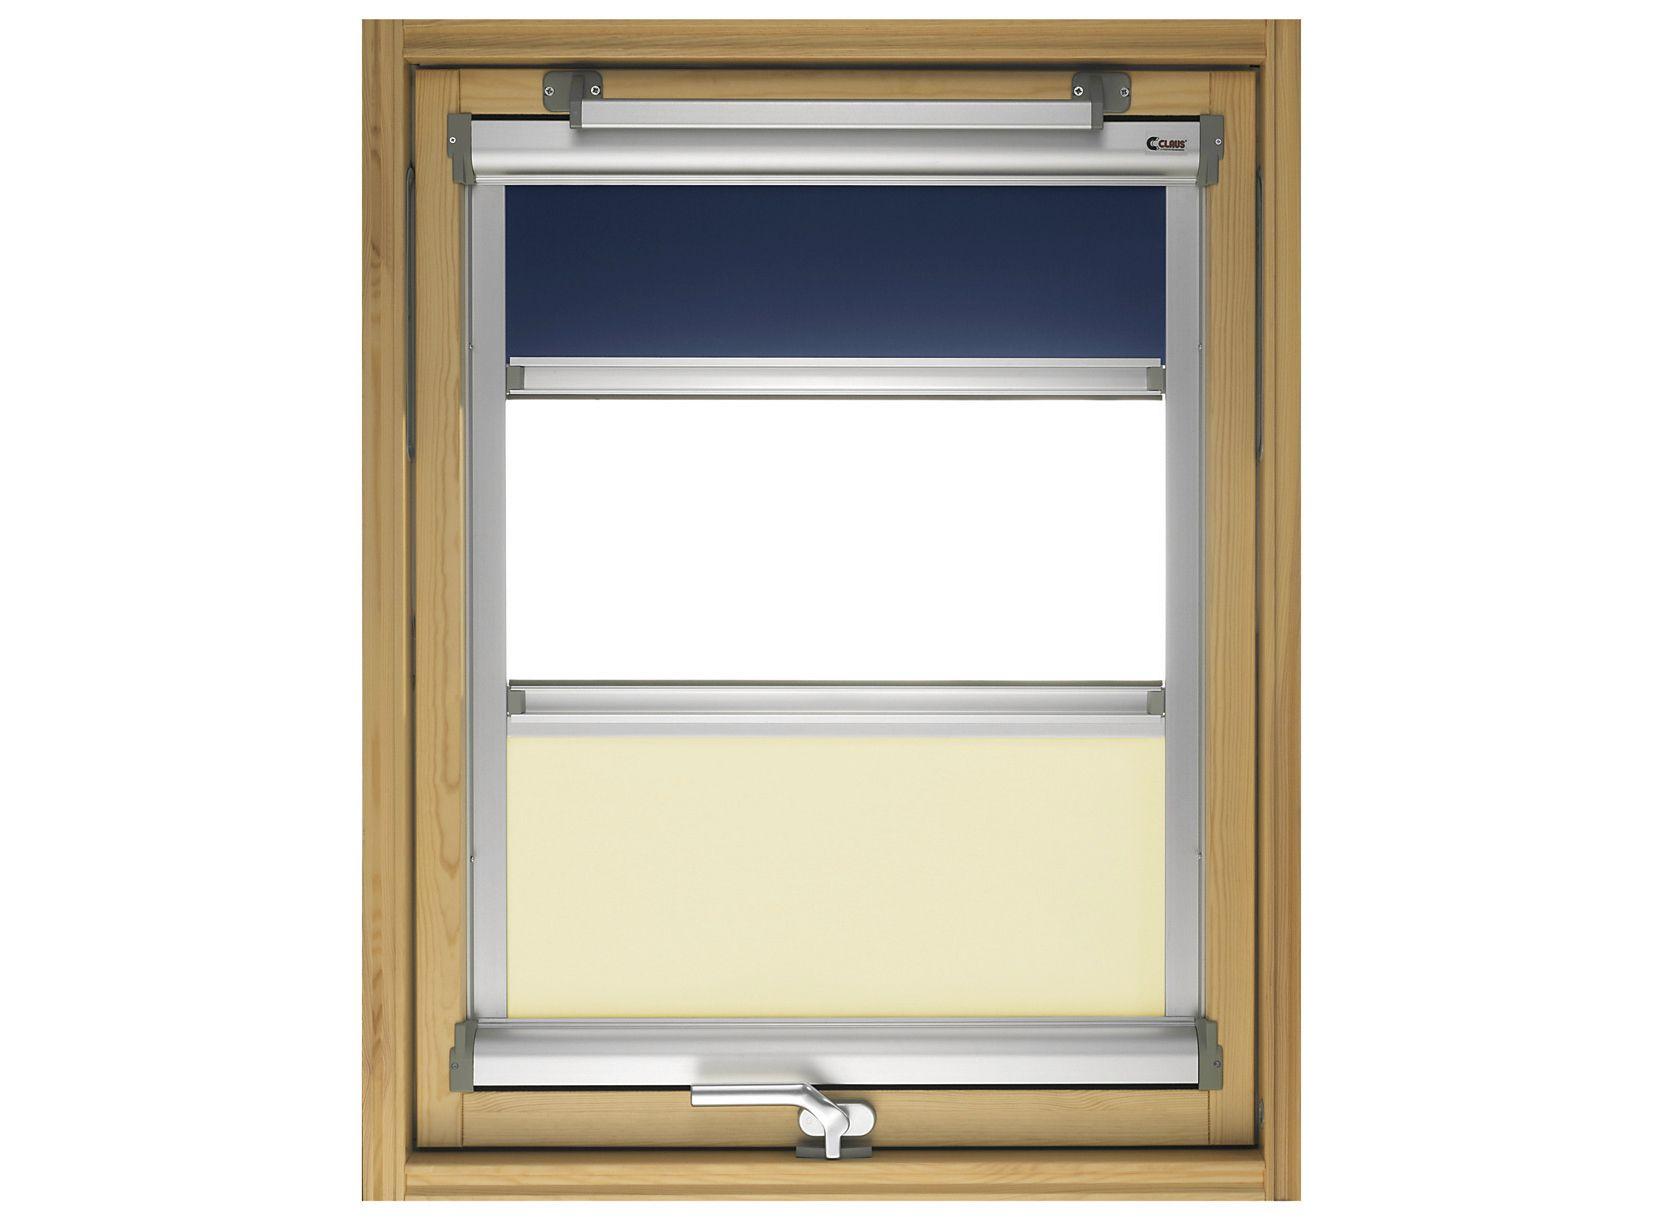 Cortinas para ventanas abatibles beautiful soporte for Ventanas de aluminio con cortina